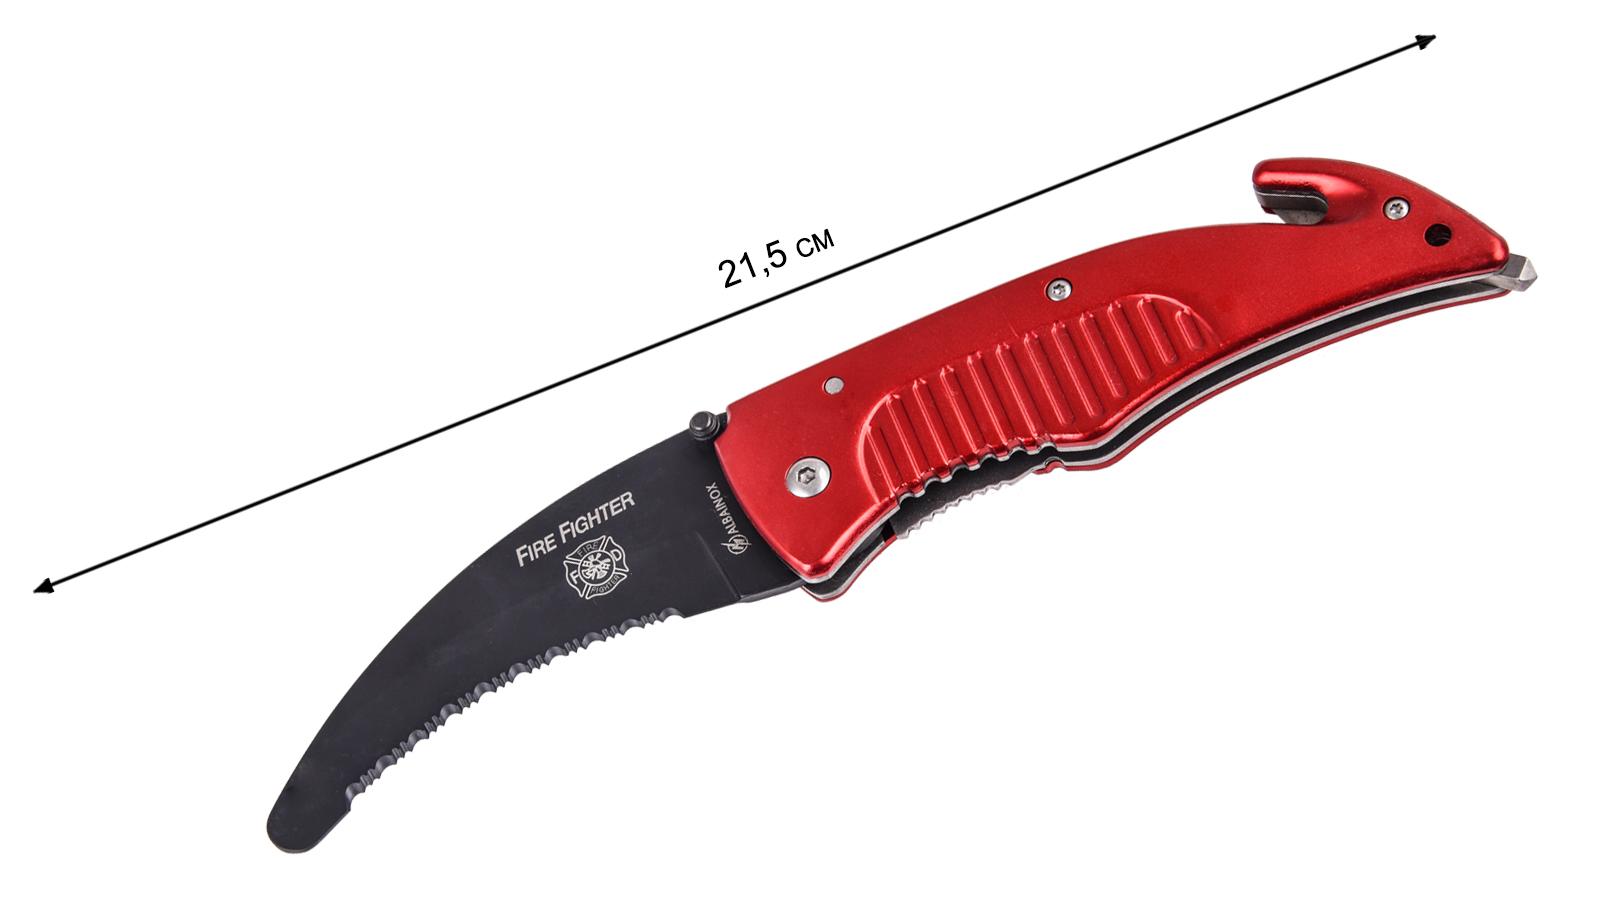 Аварийный нож Martinez Albainox 10759 Fire Fighter (Испания)